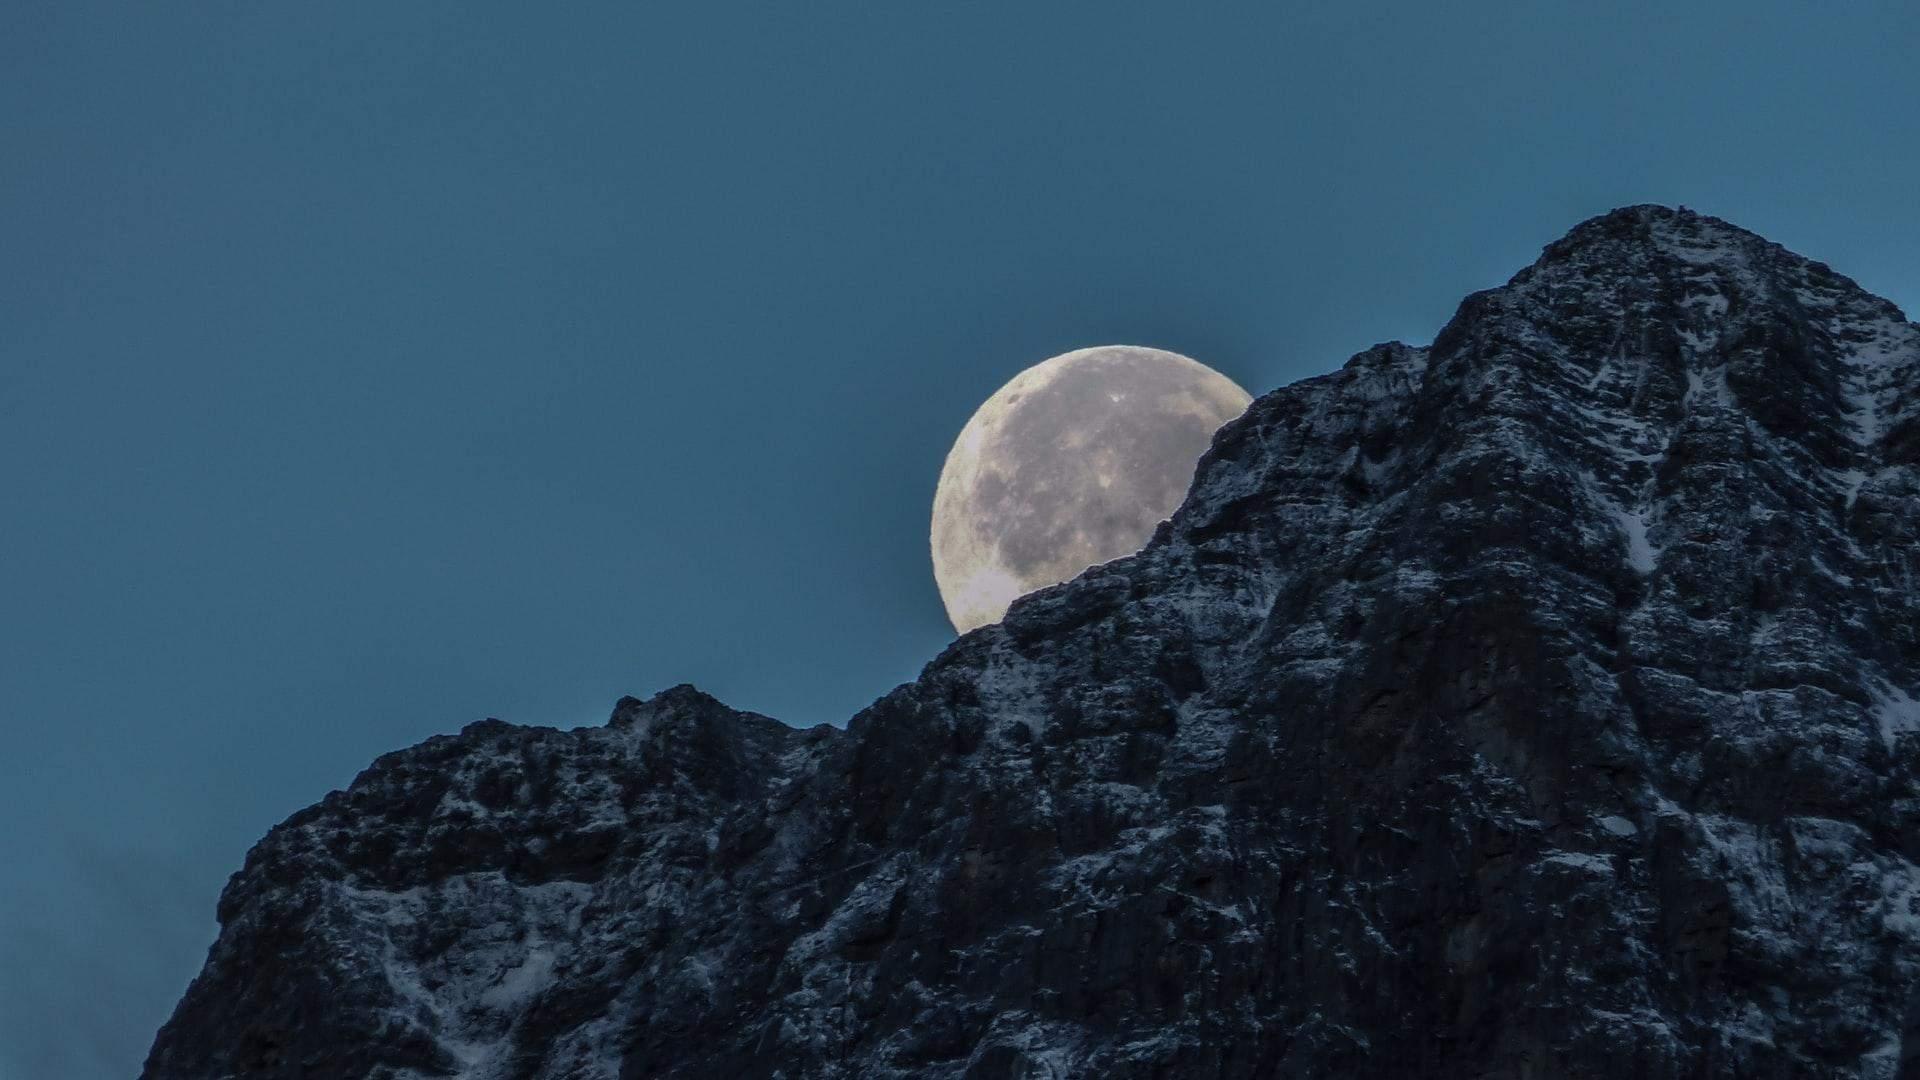 Яка відстань між Землею та Місяцем